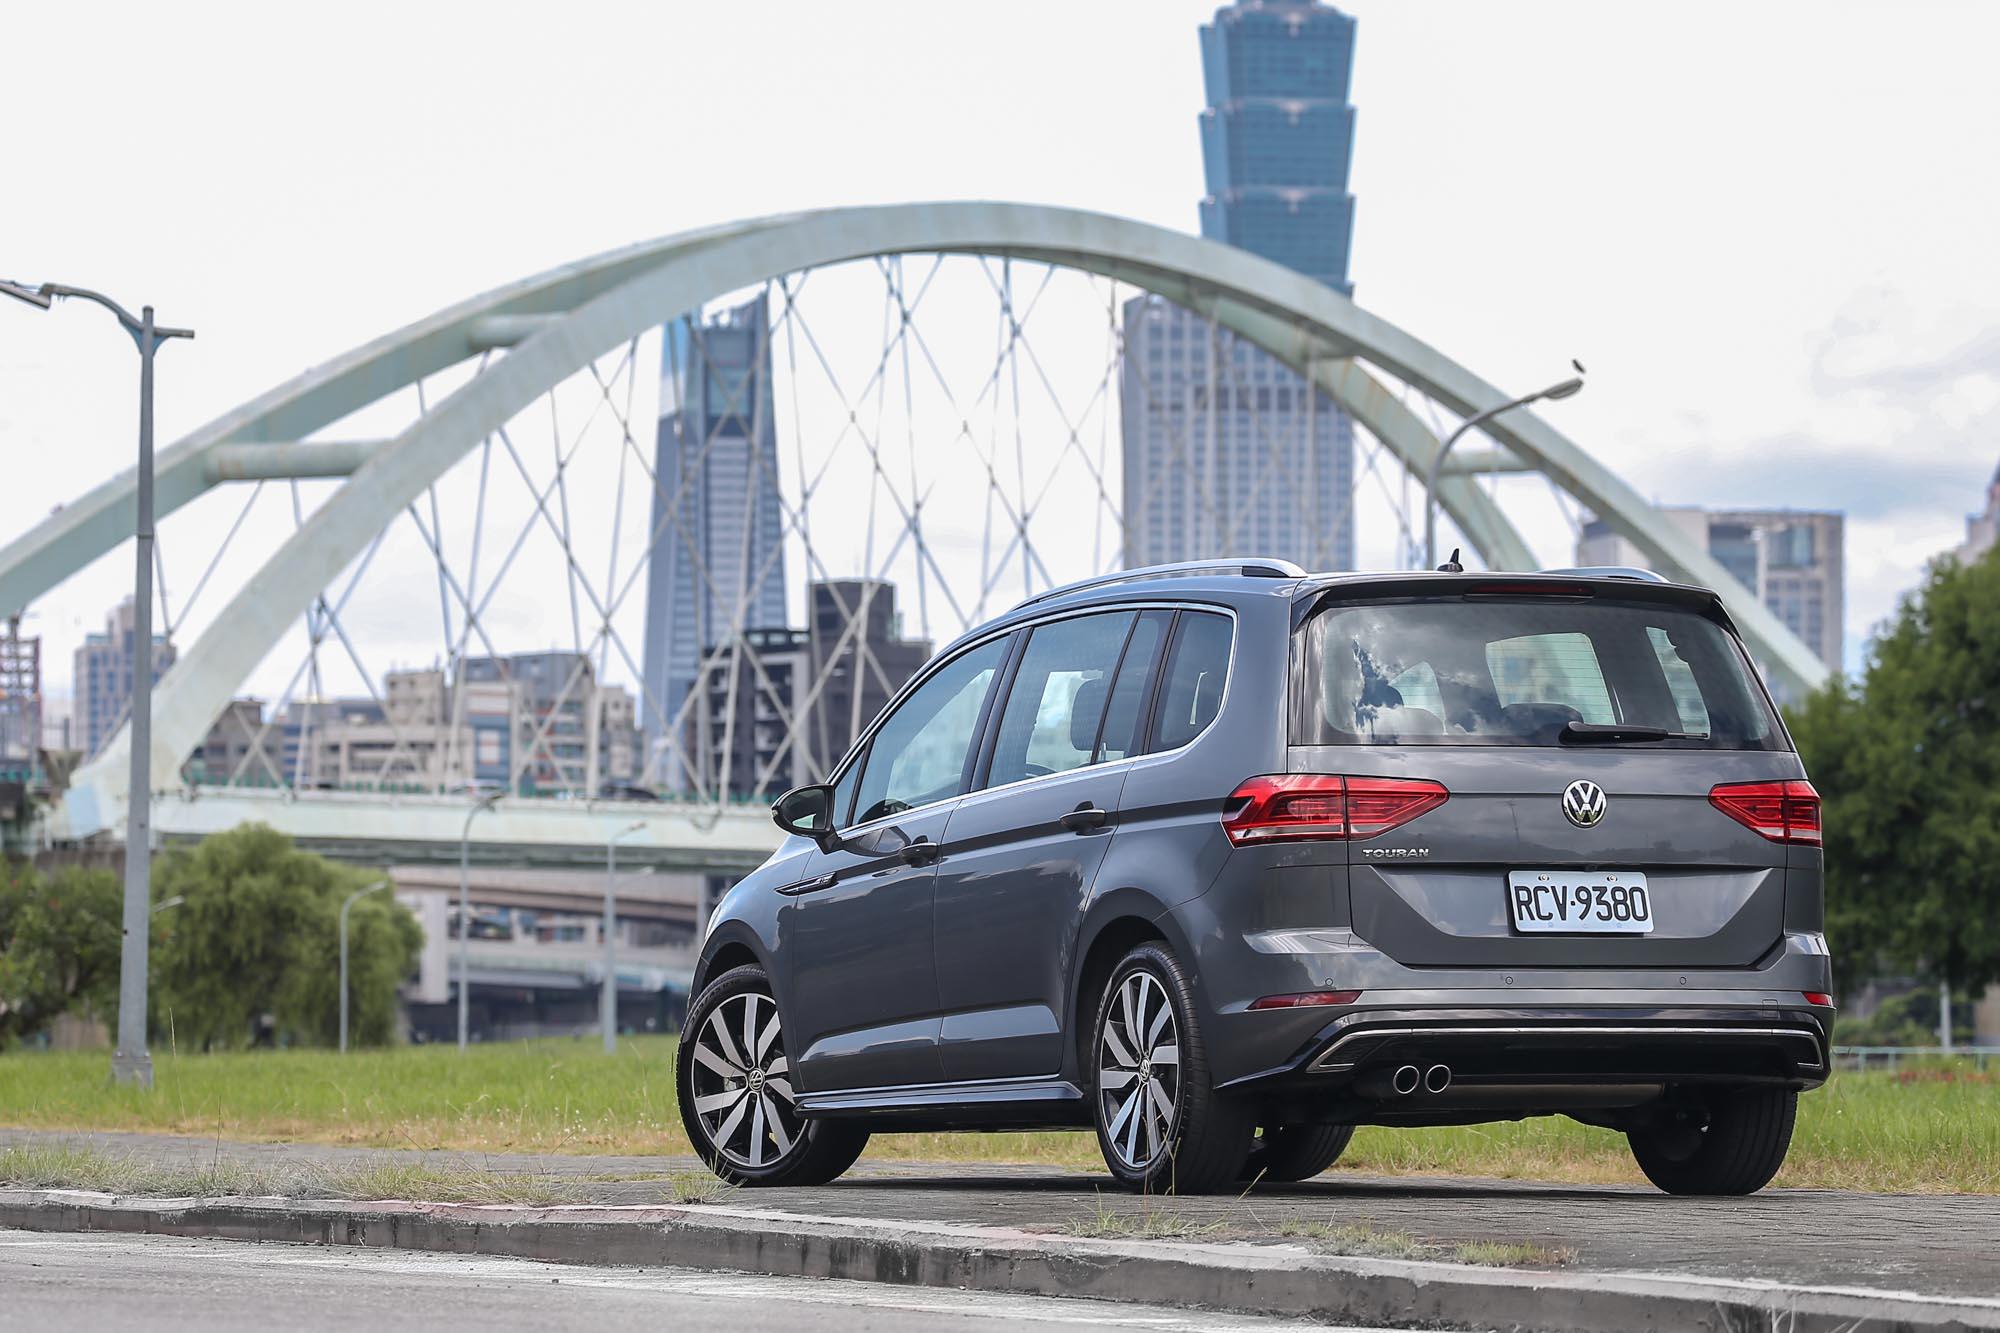 試駕車型為 Volkswagen Touran 280 TSI R-Line,售價為新台幣 138.8 萬元。